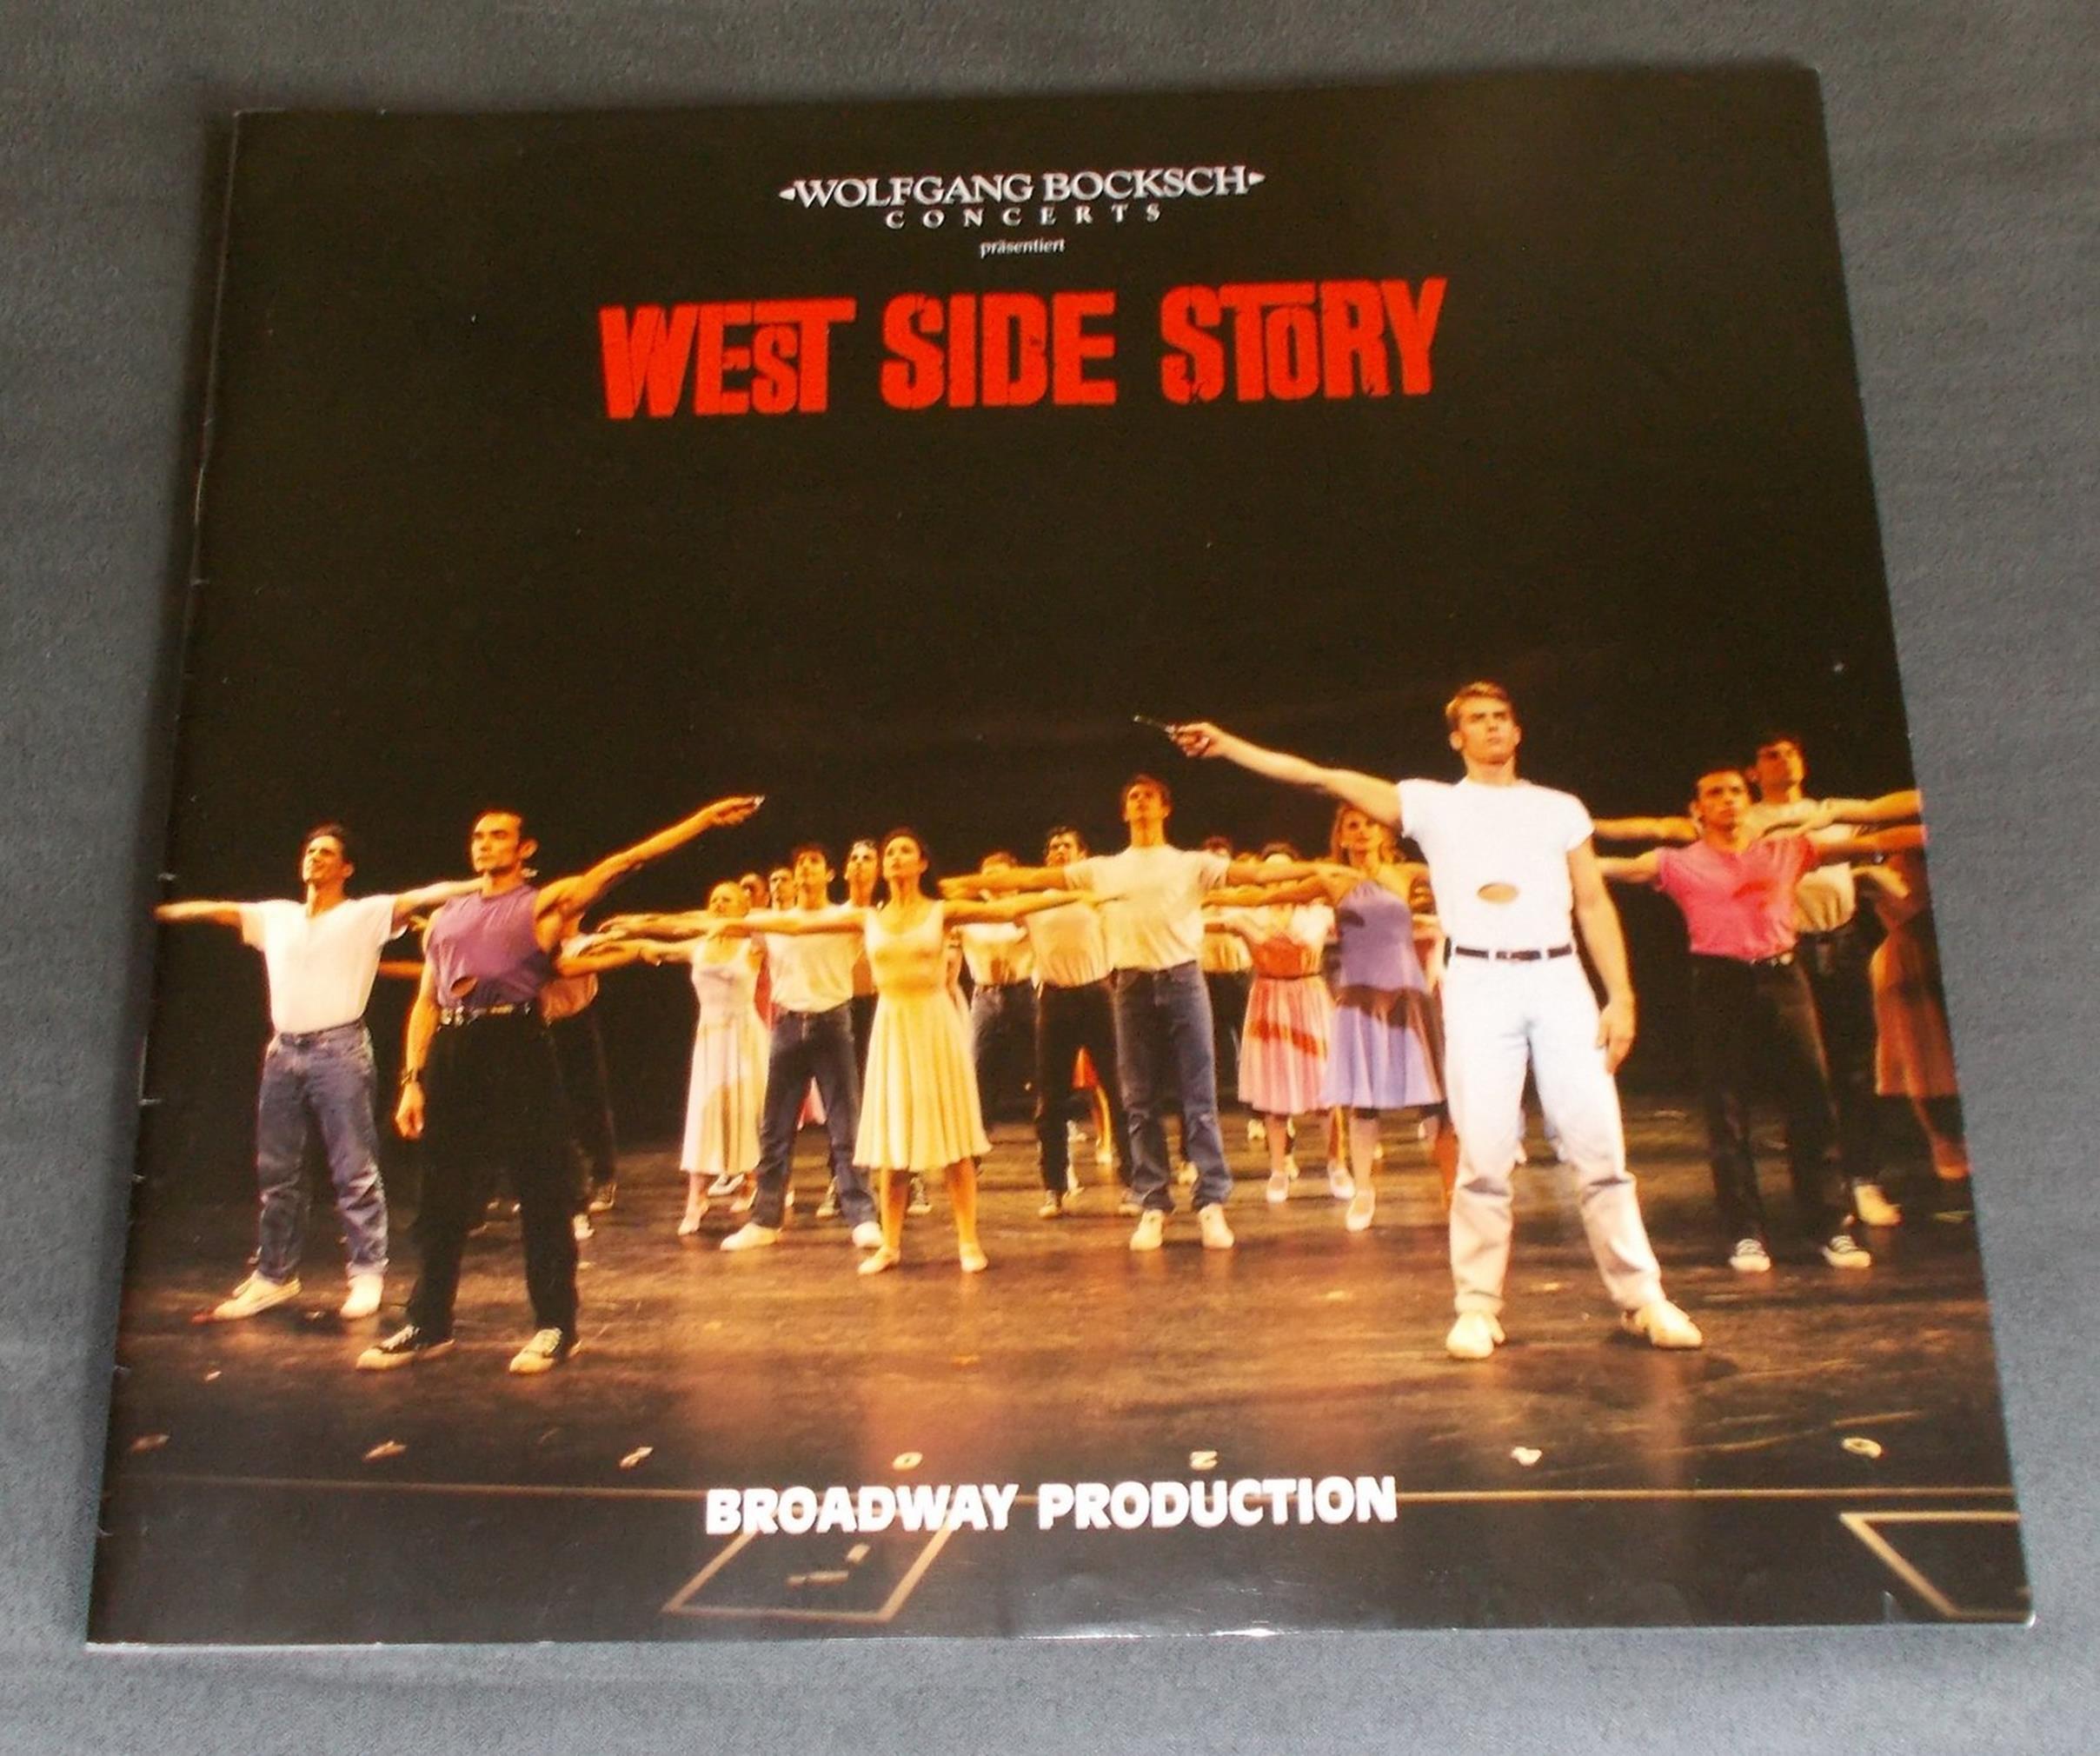 Programmheft WEST SIDE STORY. Broadway Production Wolfgang Bocksch